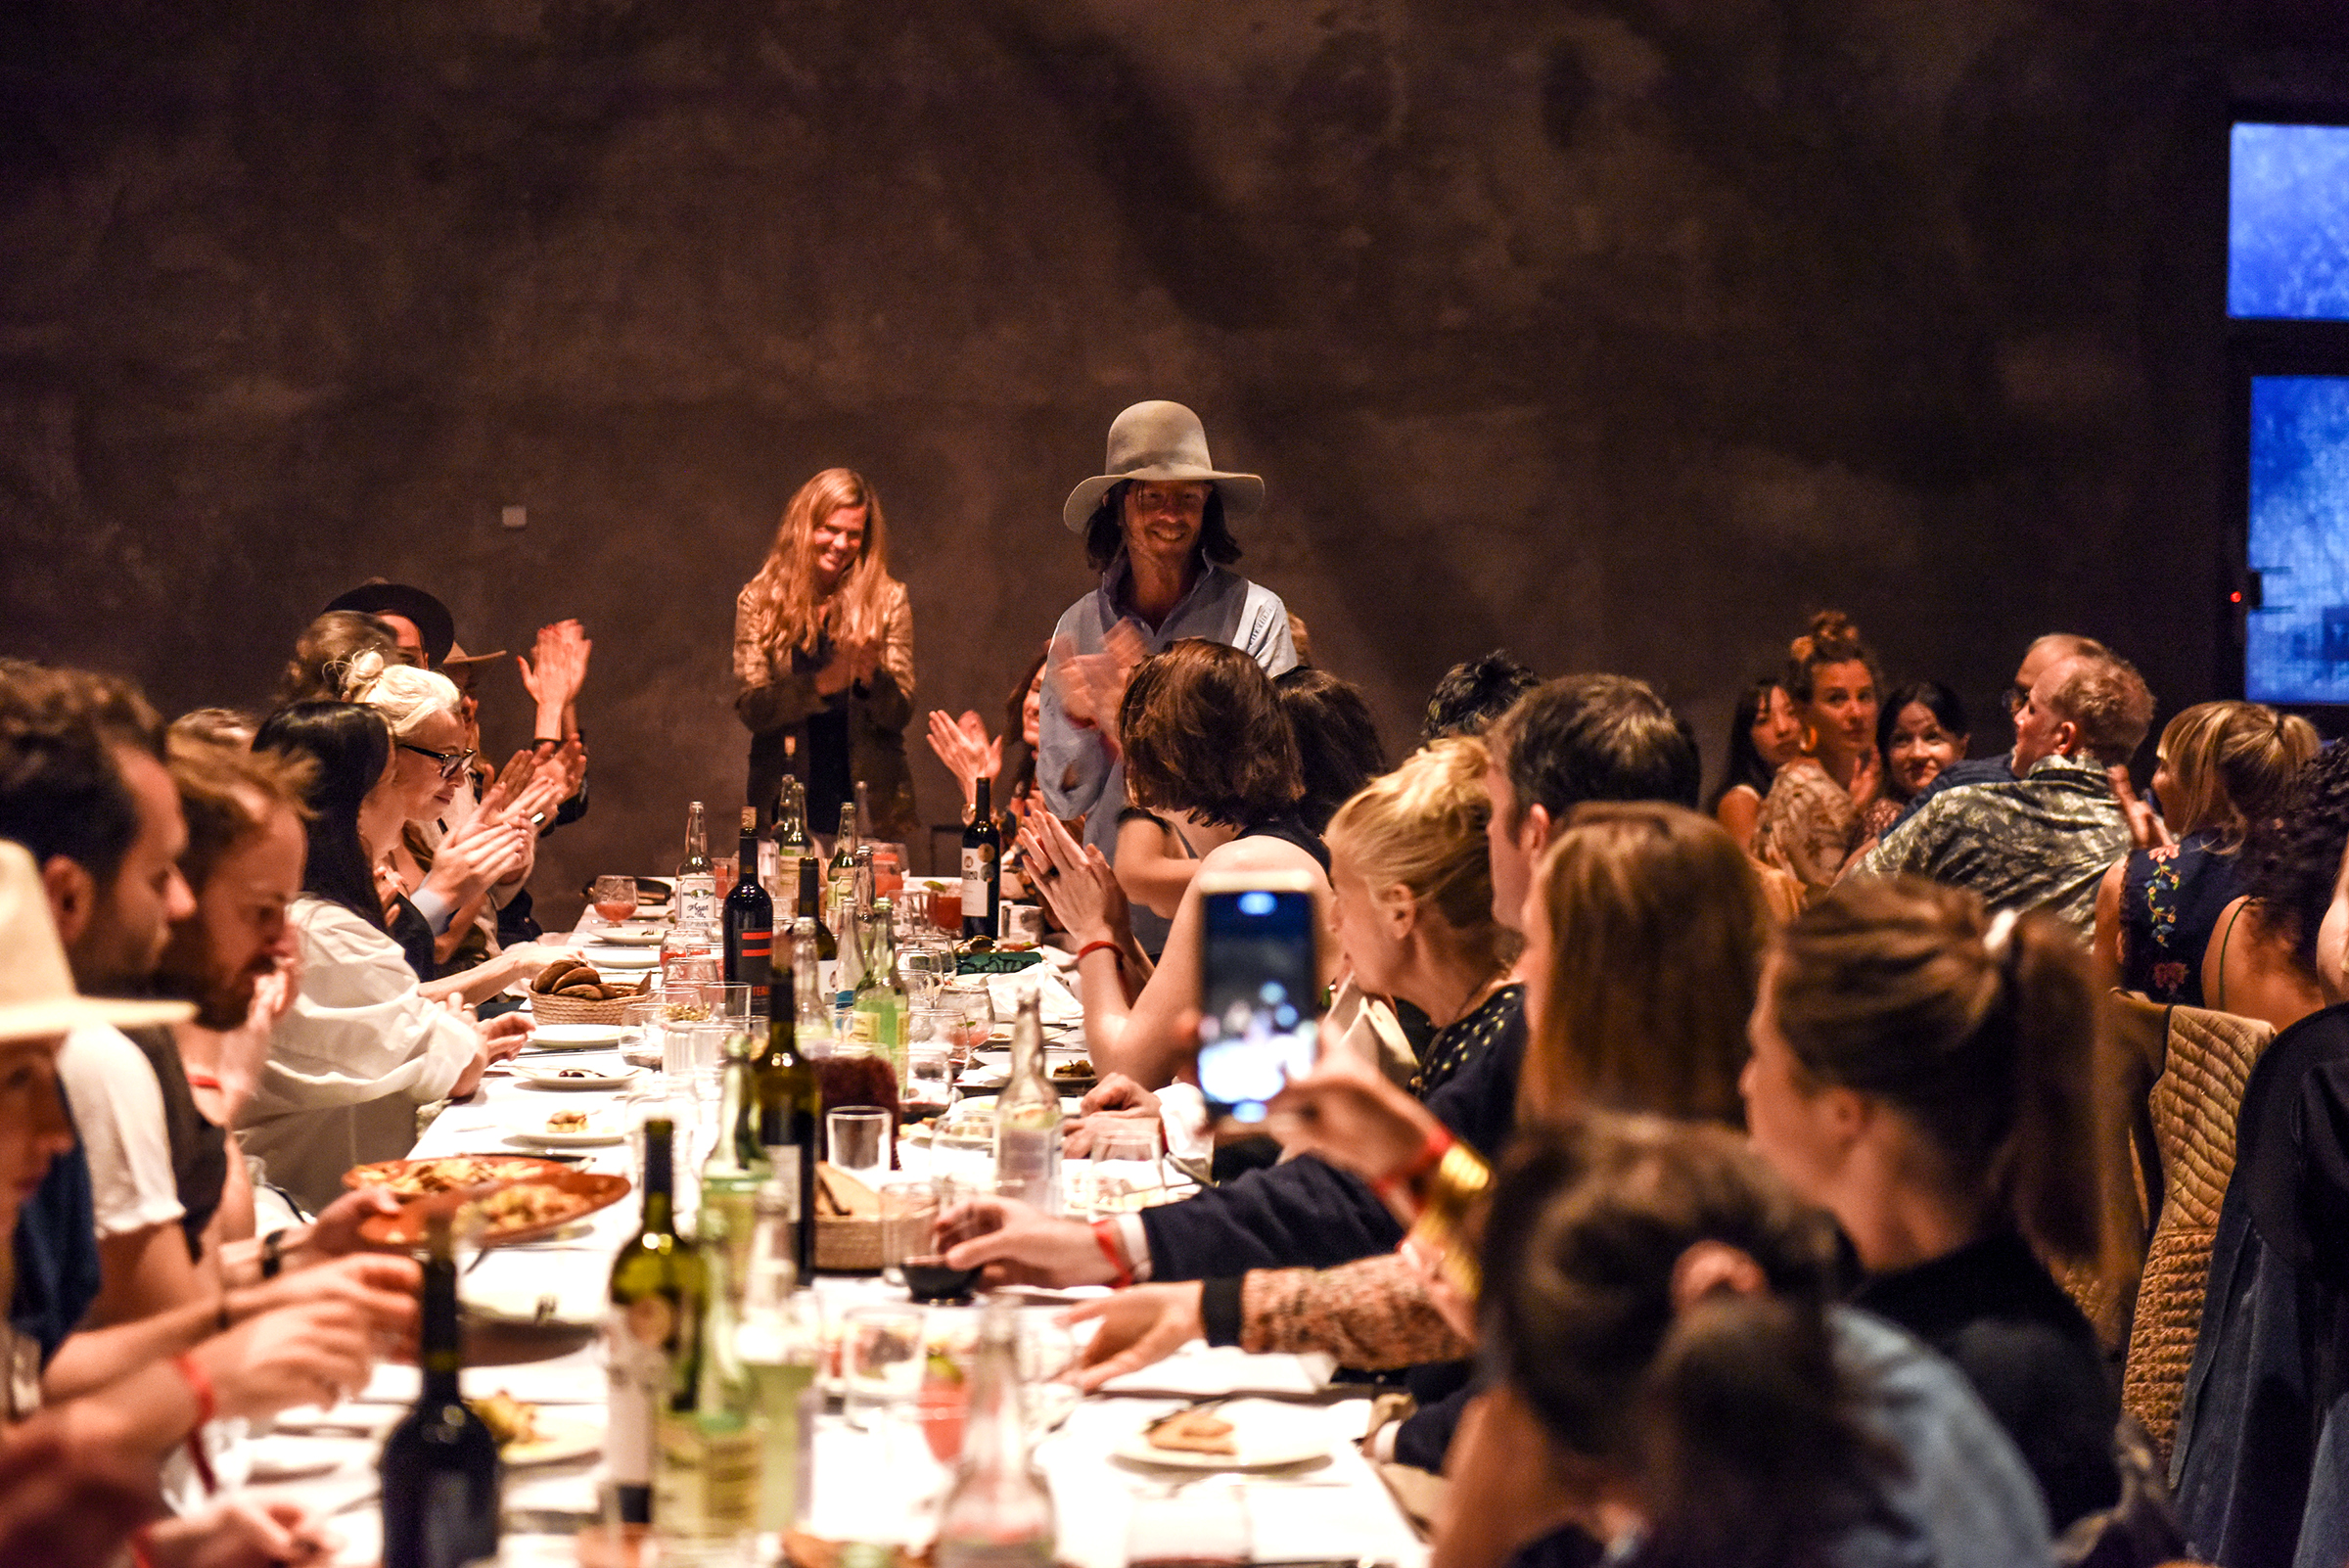 MI COCKTAIL RECEPTION + DINNER   THE CAPRI   MARFA  Kimberly Gould, Michael Phelan